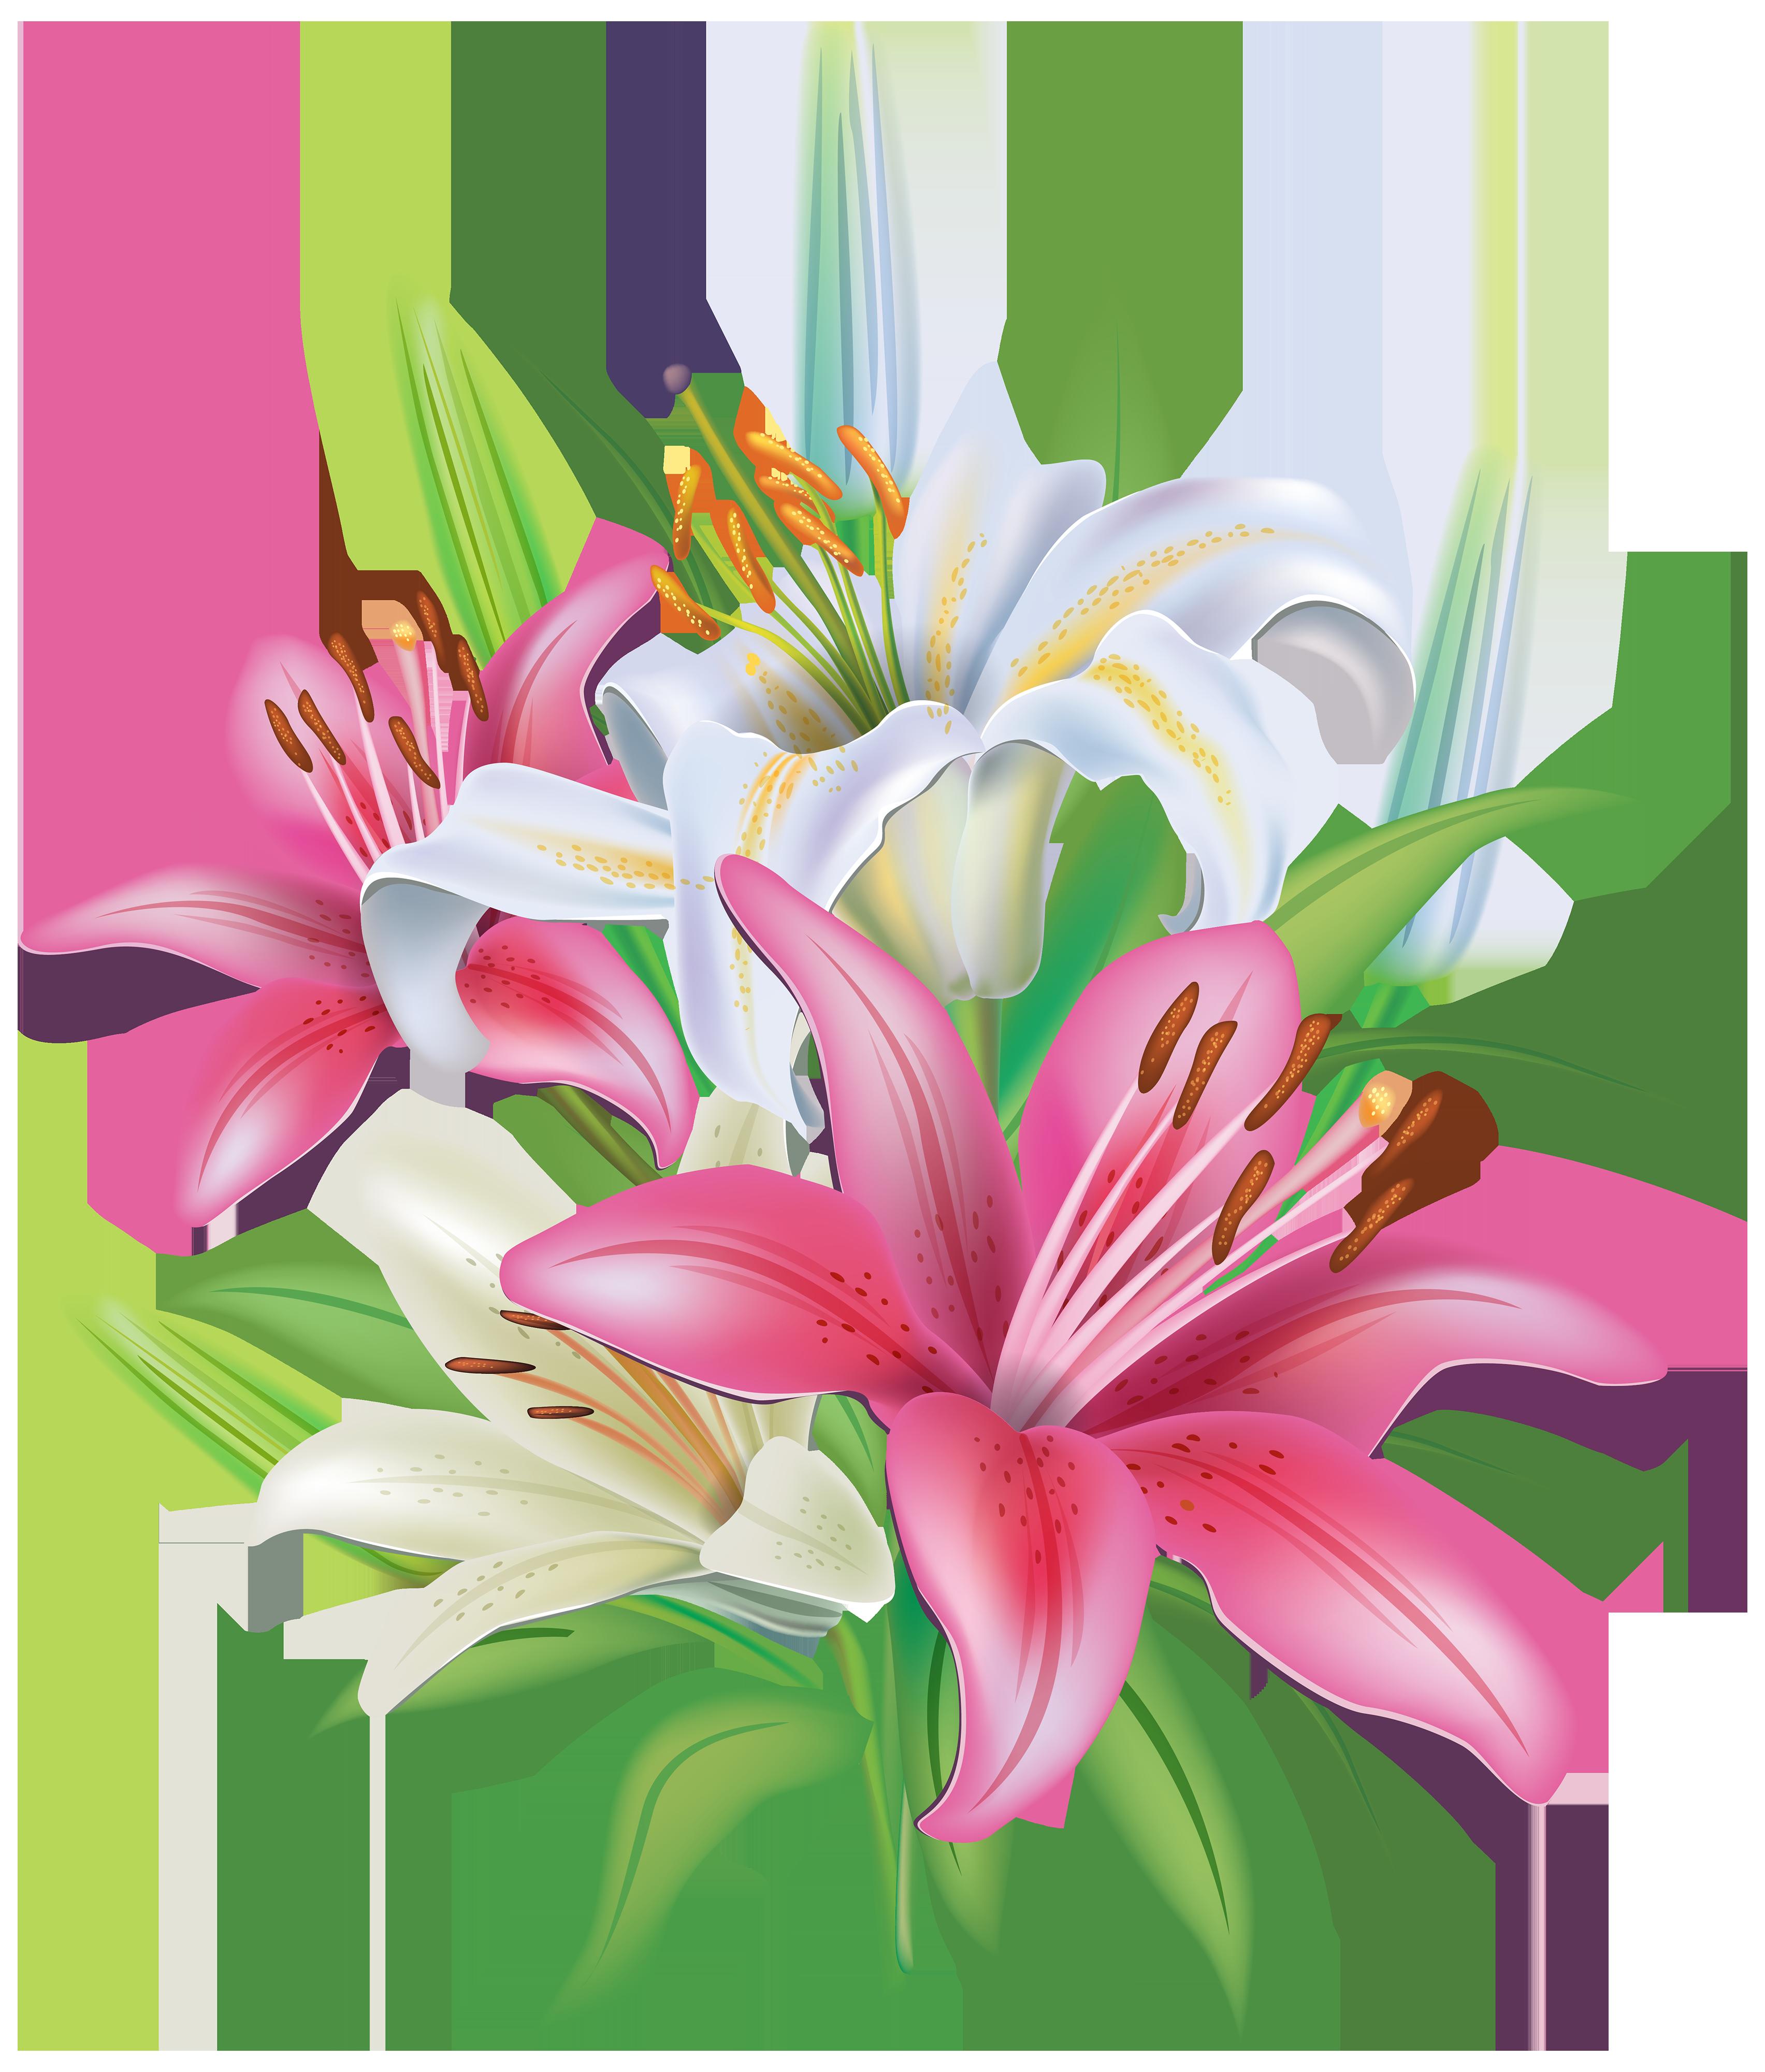 Lilies flowers decoration png. Clipart easter bouquet